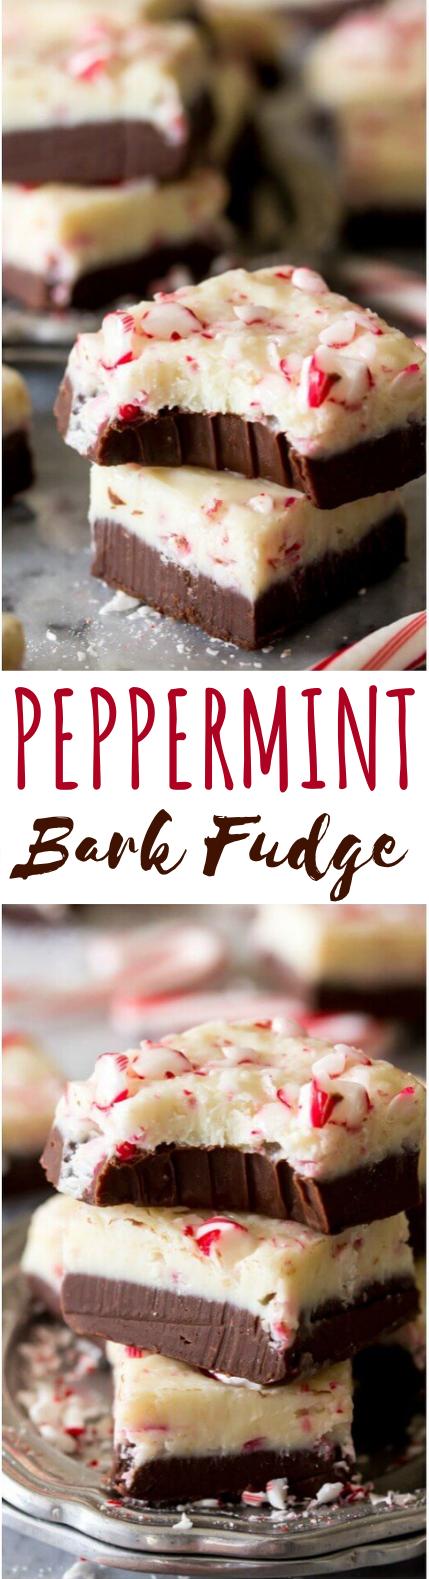 Peppermint Bark Fudge #desserts #recipe #chocolate #christmas #fudge